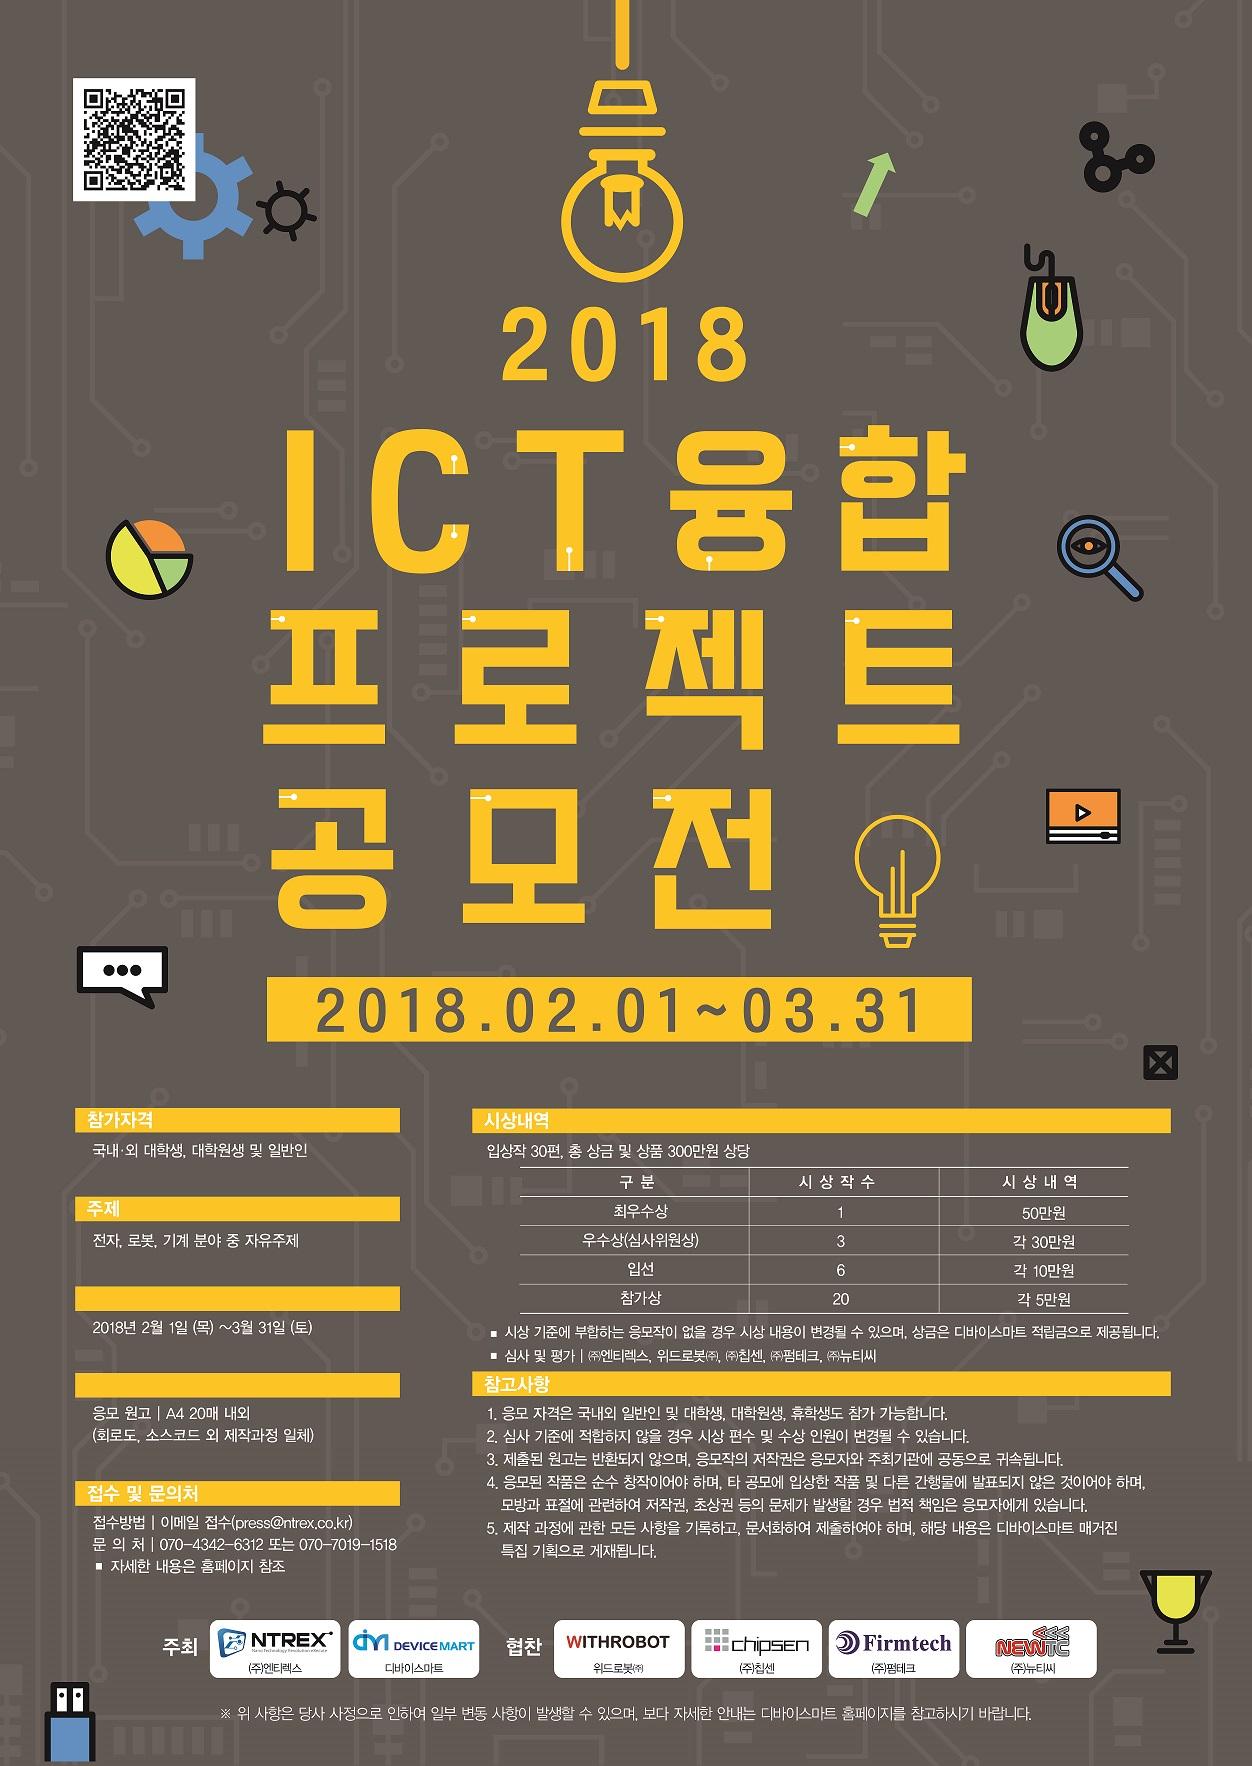 2018 ICT 융합 프로젝트 공모전